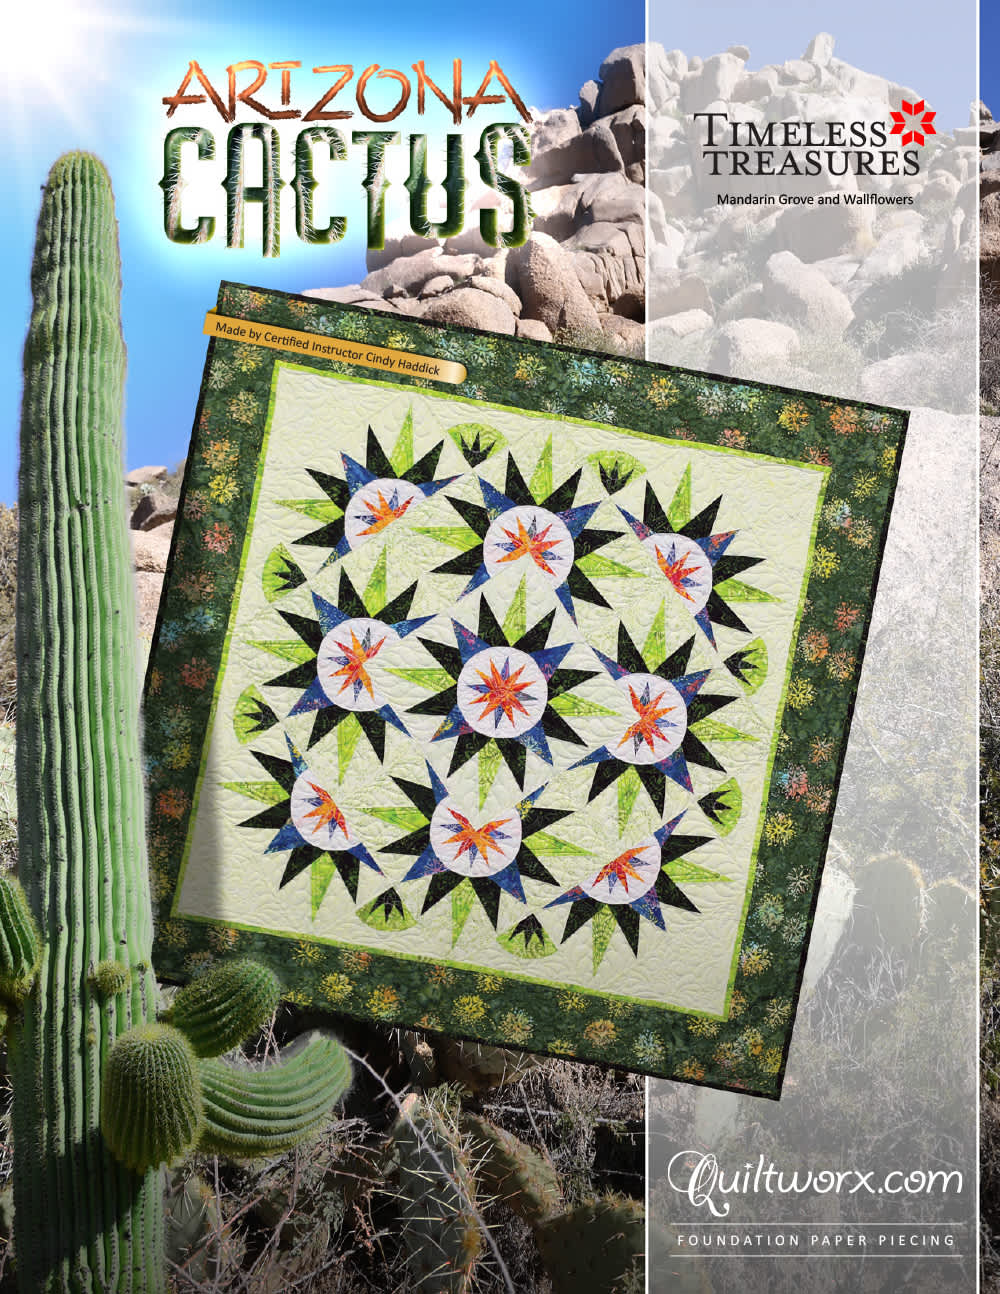 Arizona Cactus (2018)